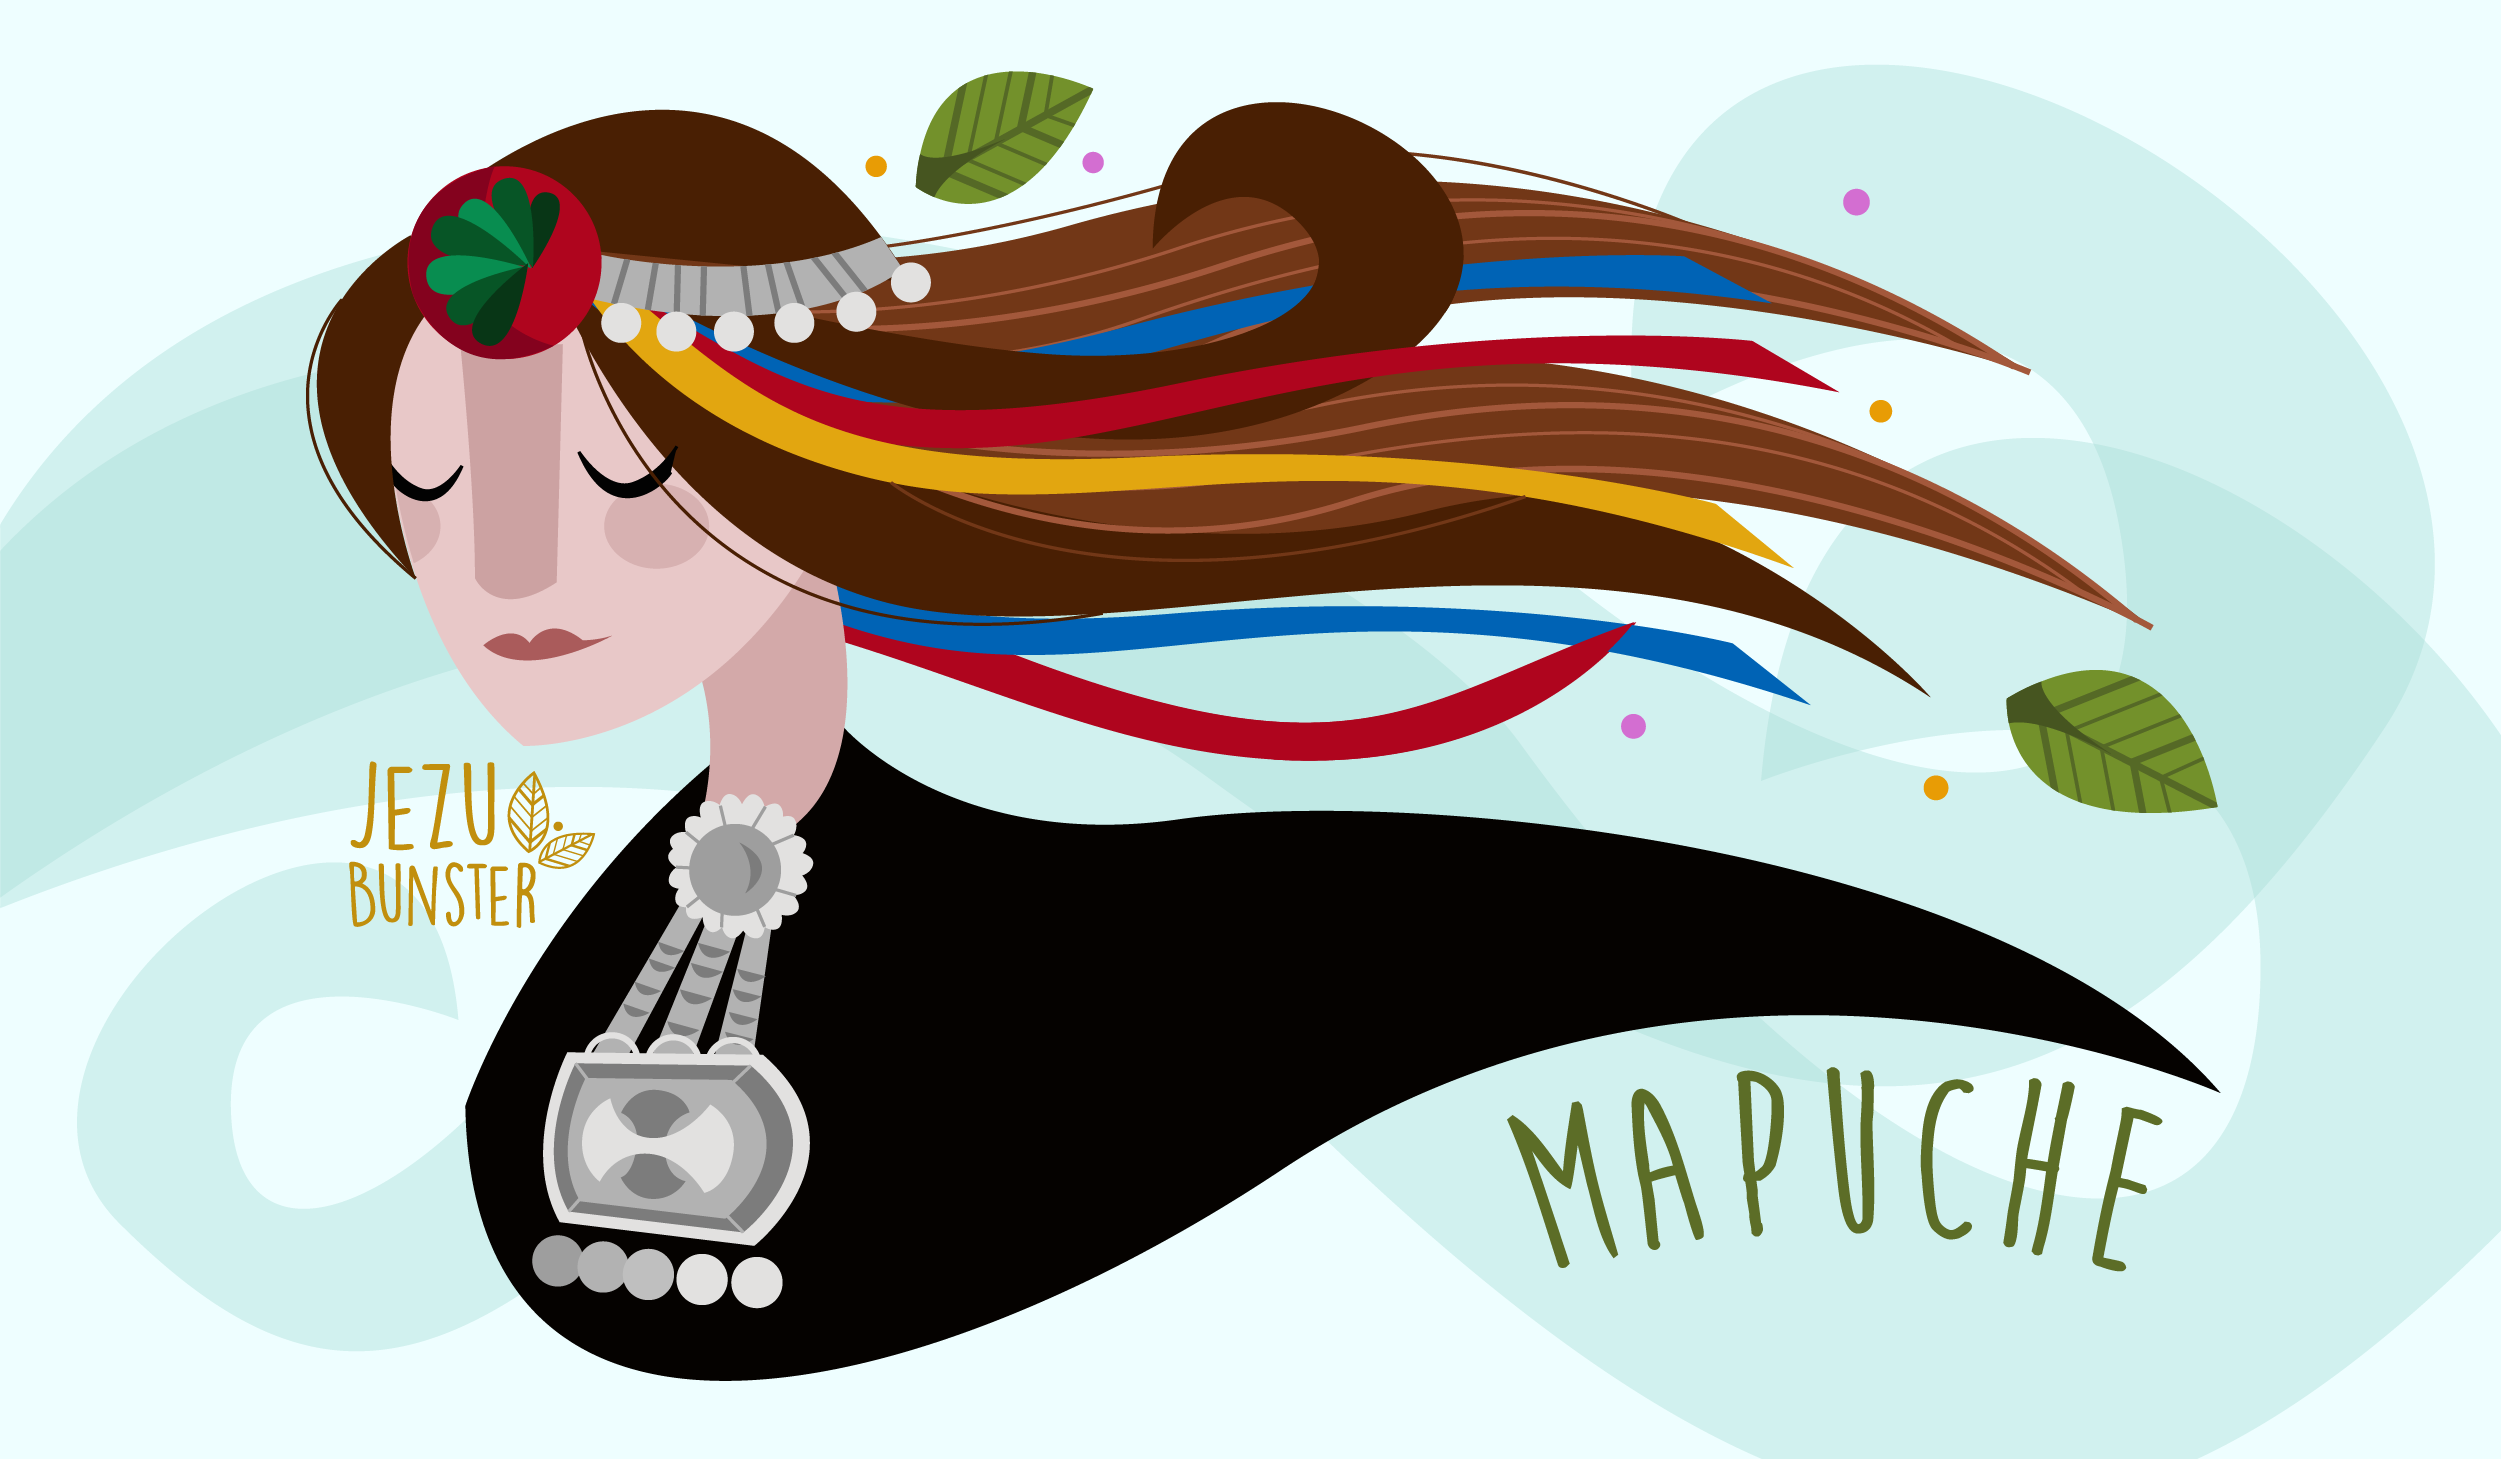 Indigenous Woman Collection Mapuche Mujer Mapuche Arte Mapuche Bandera Mapuche